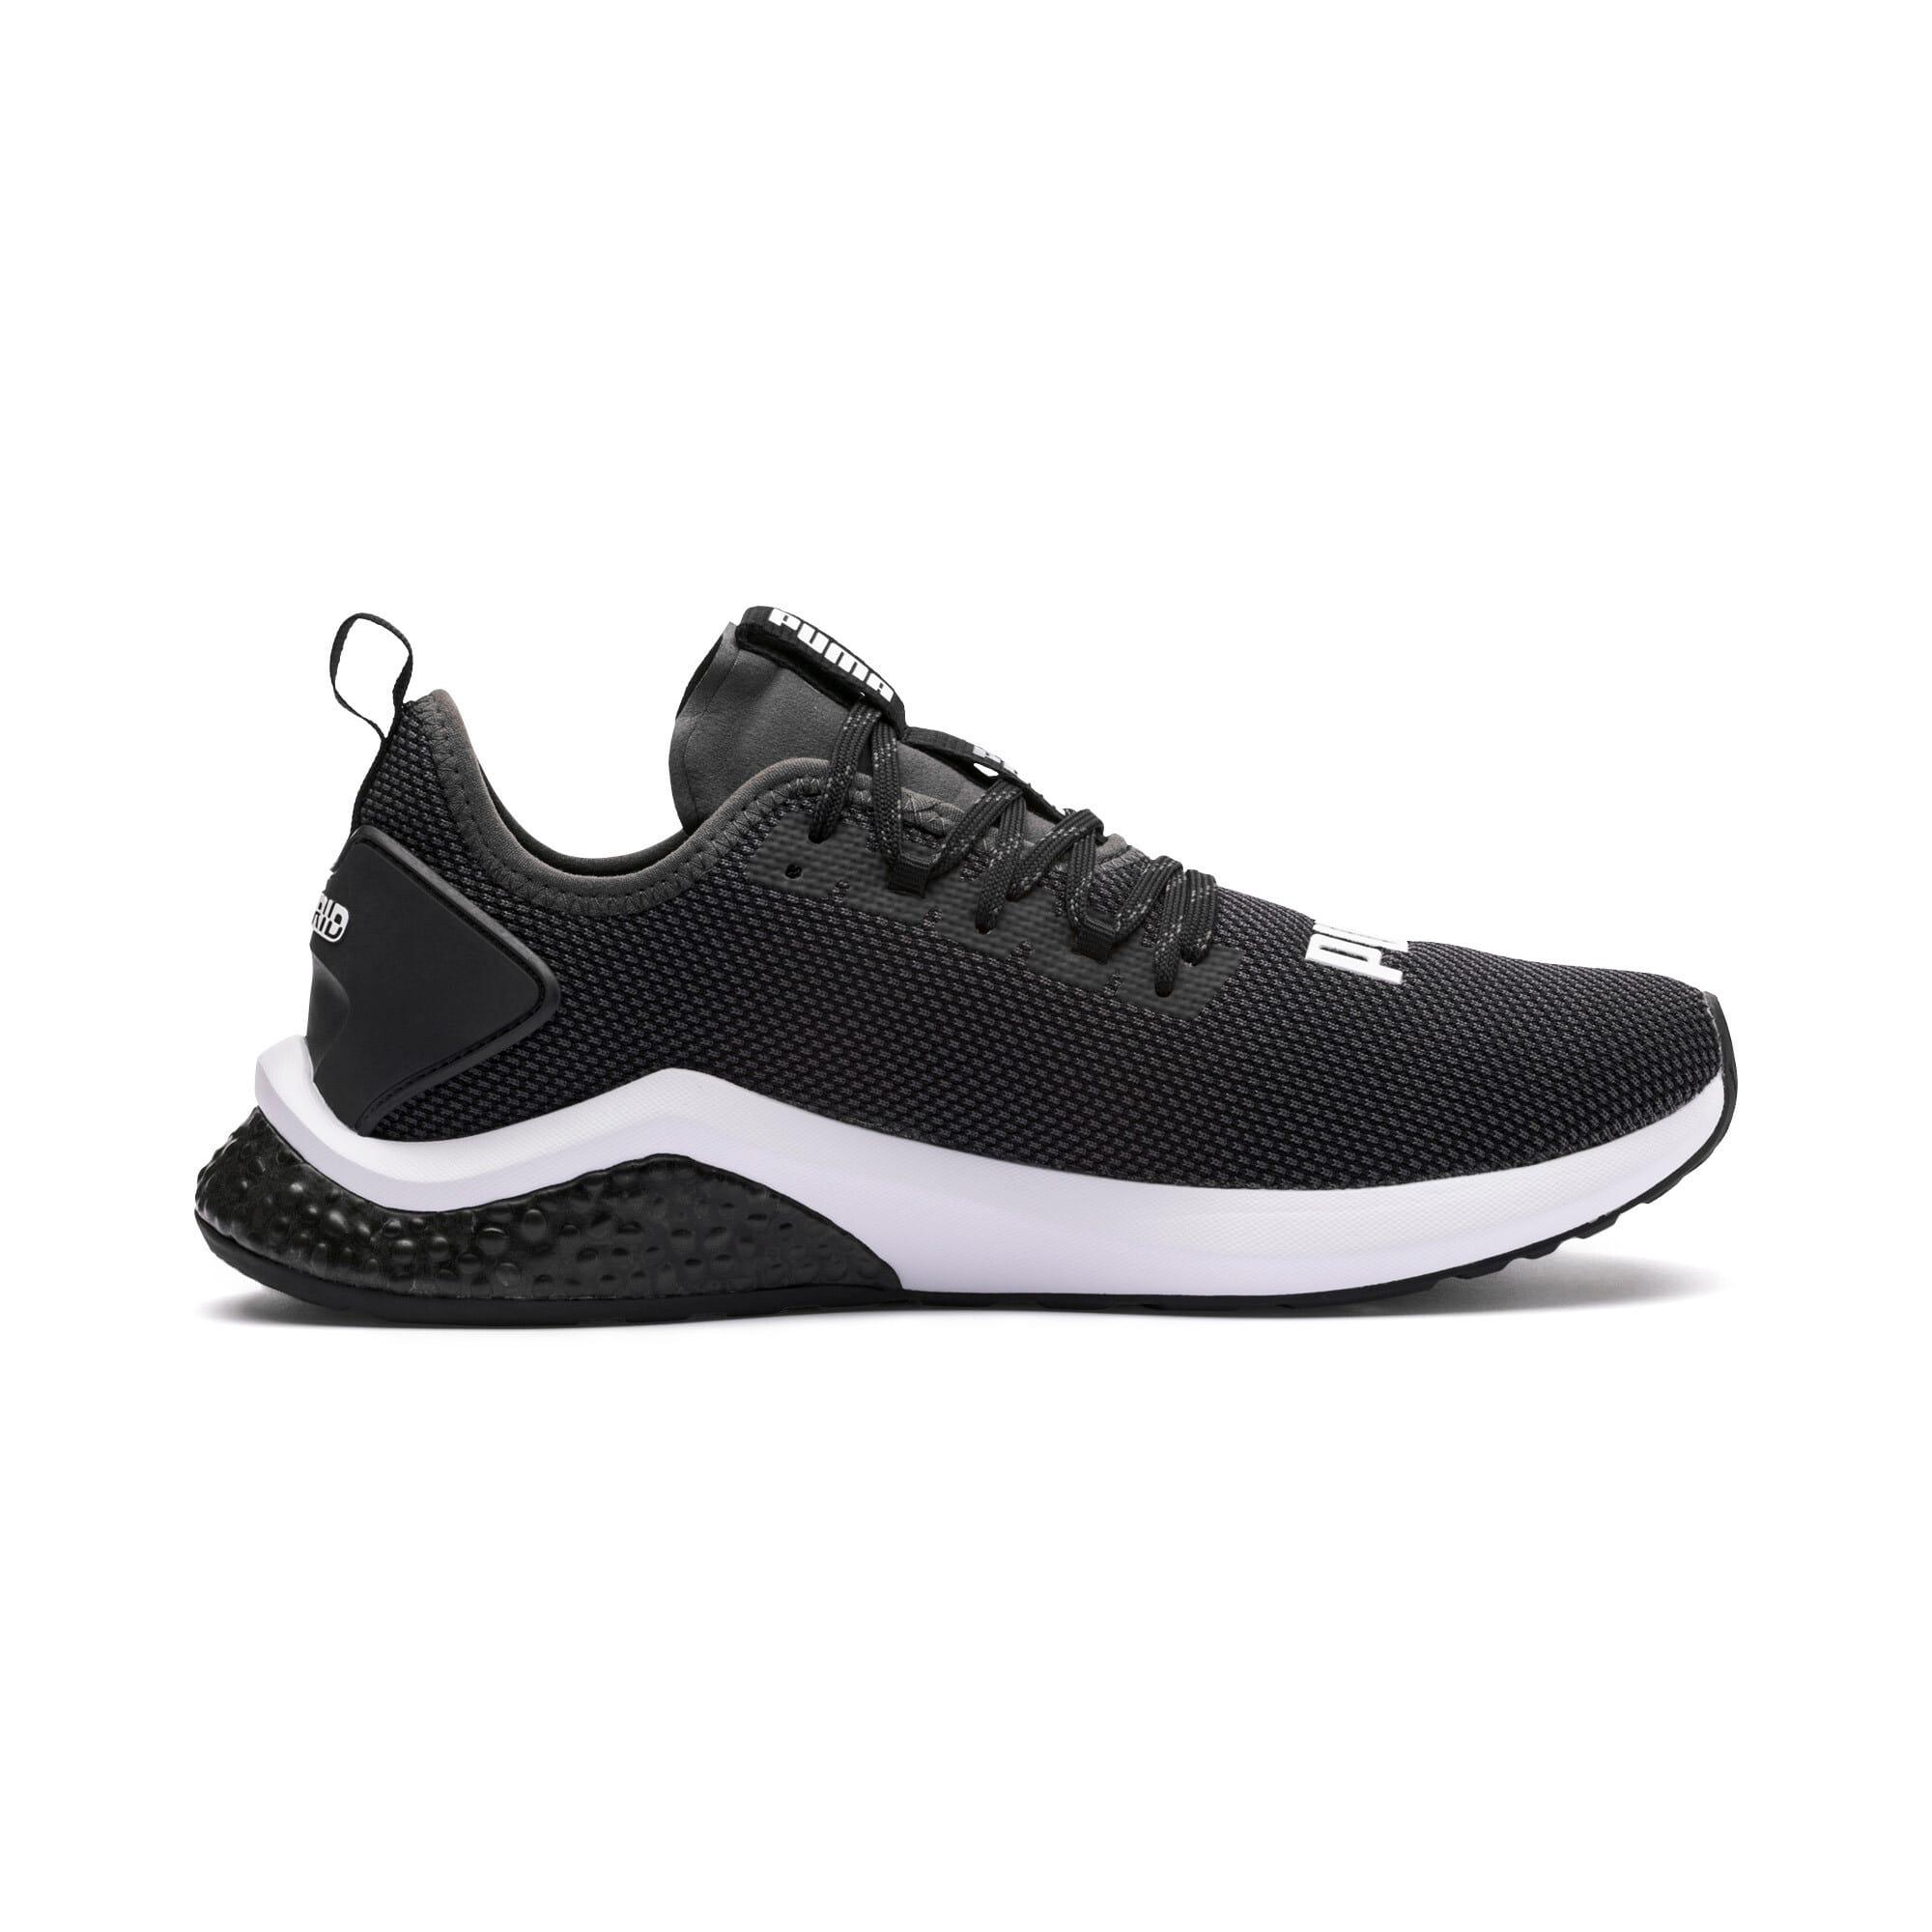 Thumbnail 6 of HYBRID NX Men's Running Shoes, Puma Black-Puma White, medium